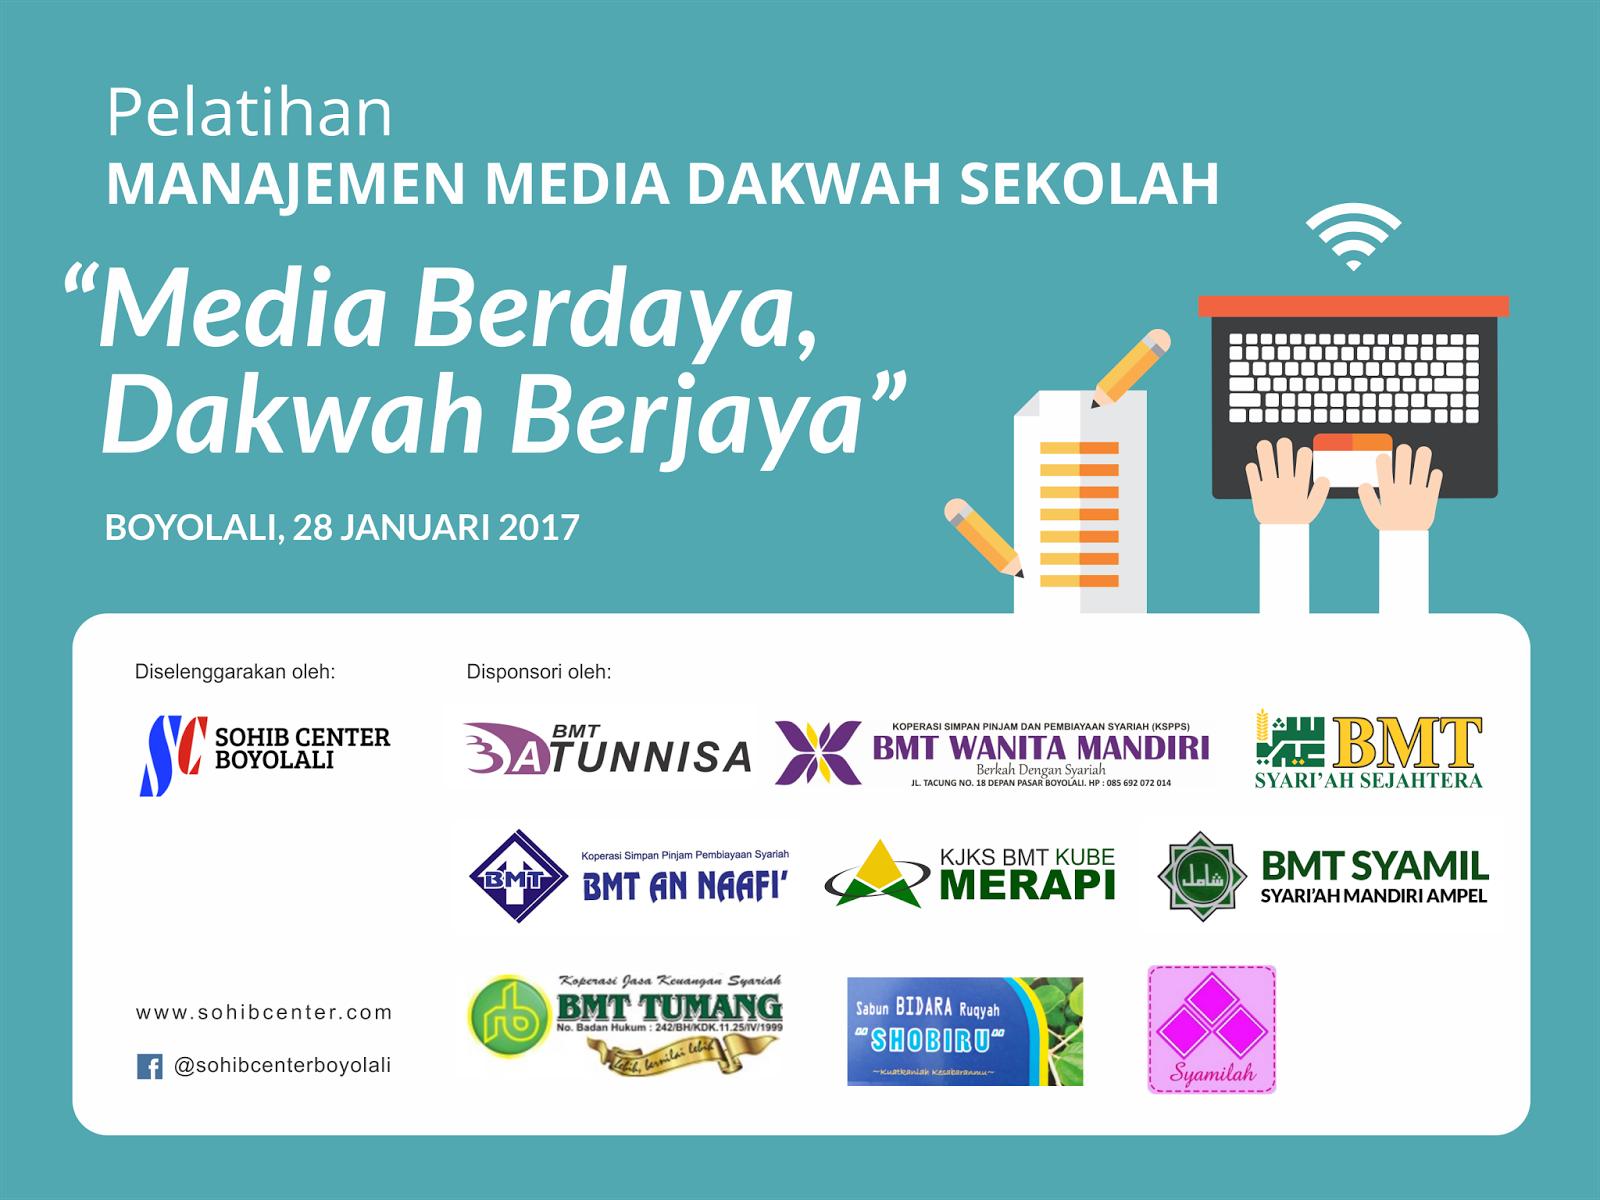 Pelatihan Manajemen Media Dakwah Sekolah Sohib Center Boyolali